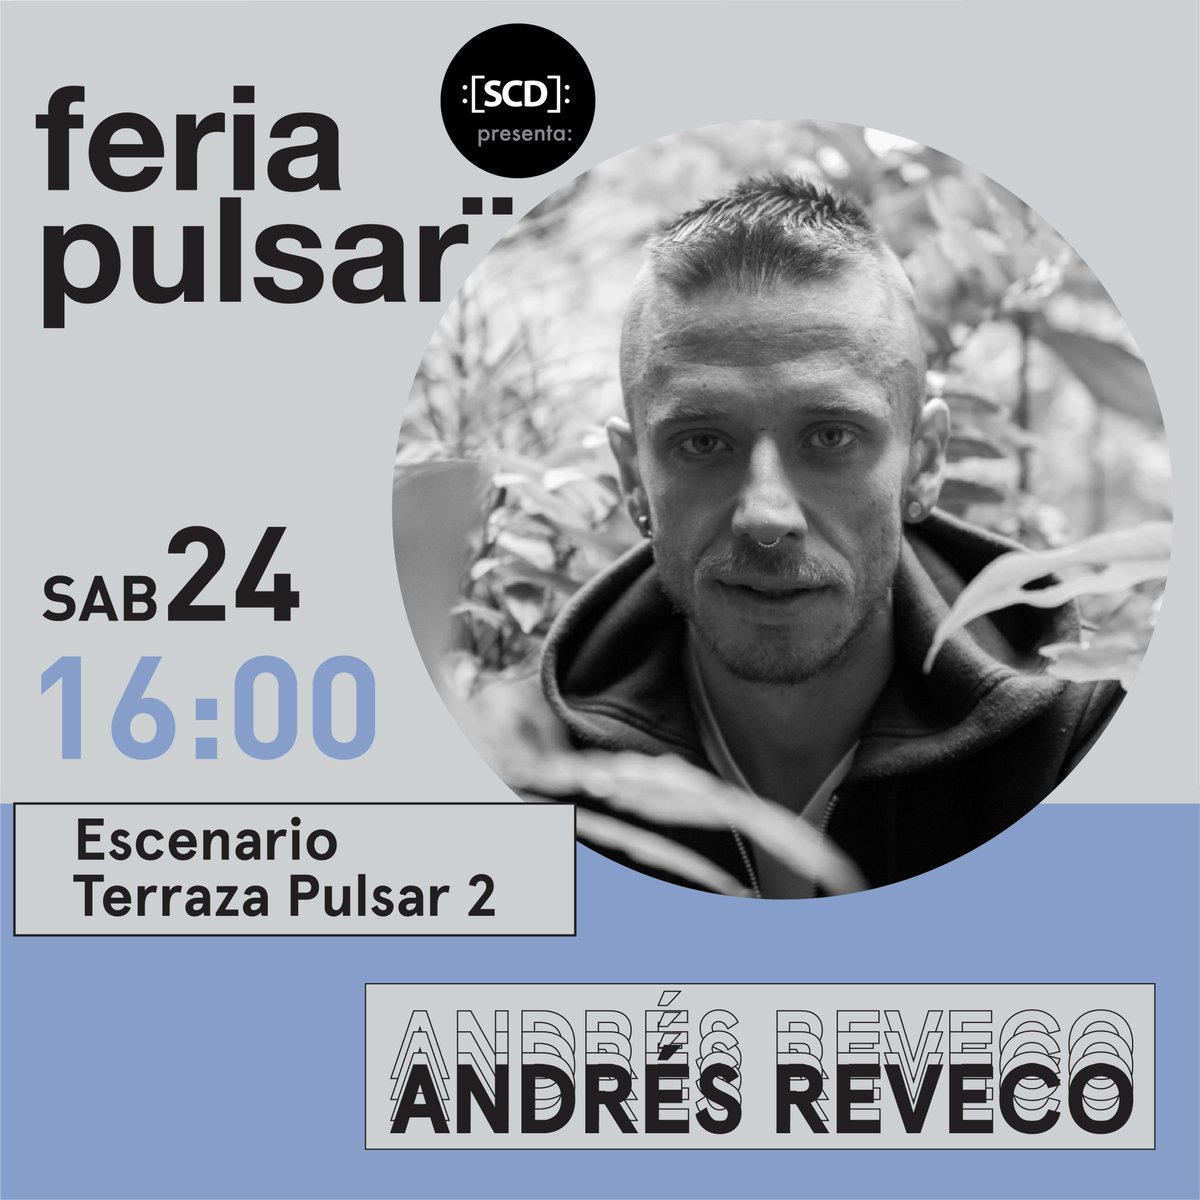 test Twitter Media - .@PulsarCL   #FeriaPulsar2018 es un espacio que mezcla diversos estilos y disciplinas en 3 días de música chilena 🙌.  Conoce el programa completo en https://t.co/1ztmFR8VGT  🎶 https://t.co/CK0QSQjL4M